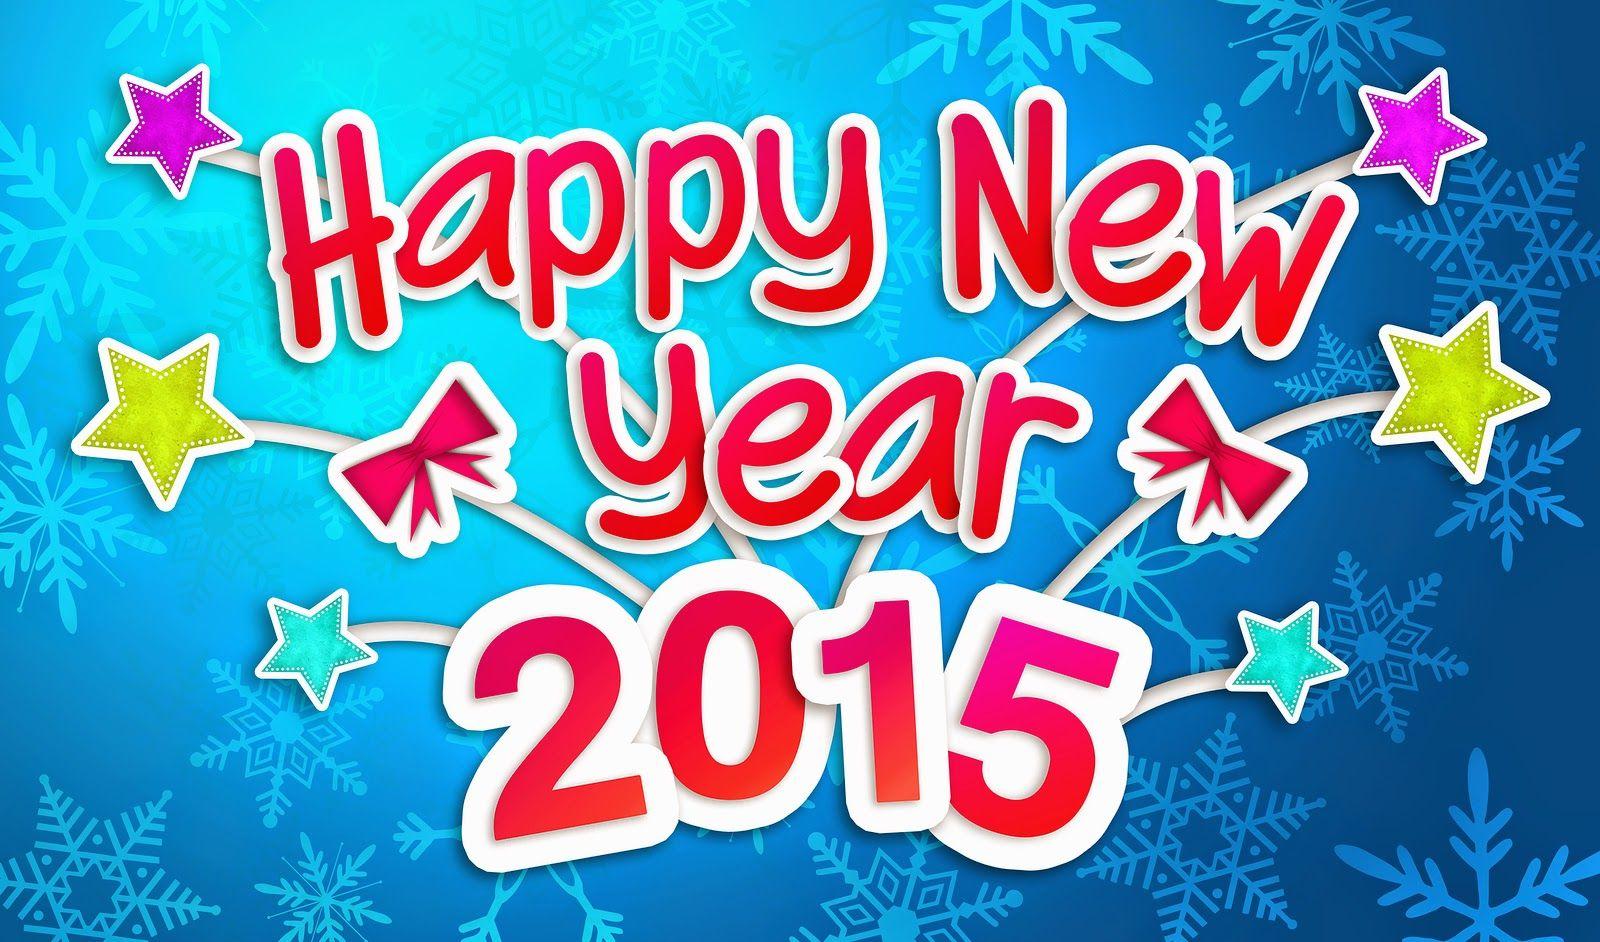 Welcome To Bukola Oyetunjis Blog Welcome To 2015 Dear Bob Readers